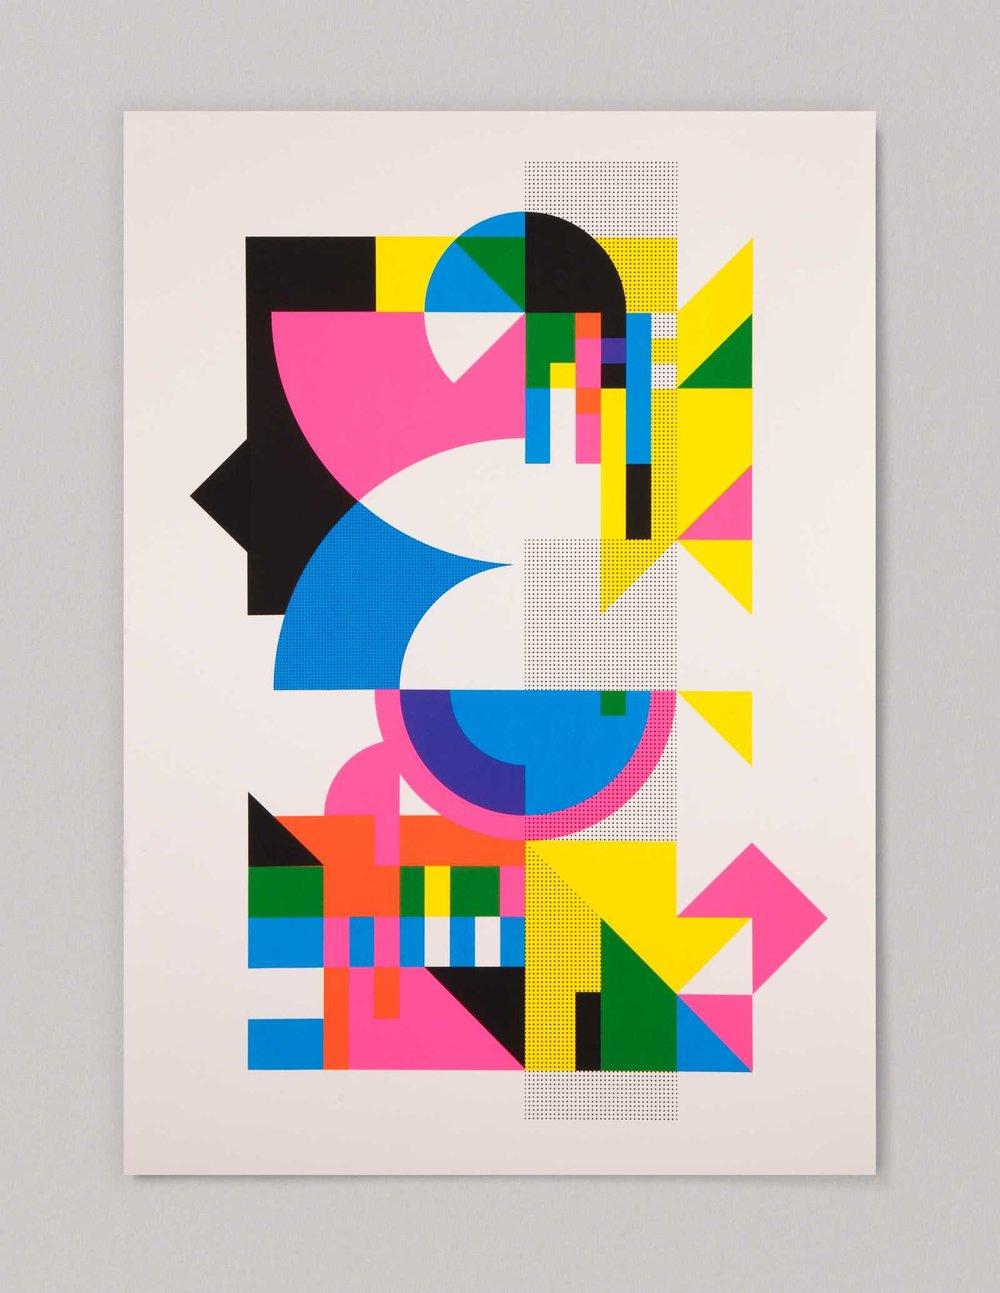 Image of grid #4